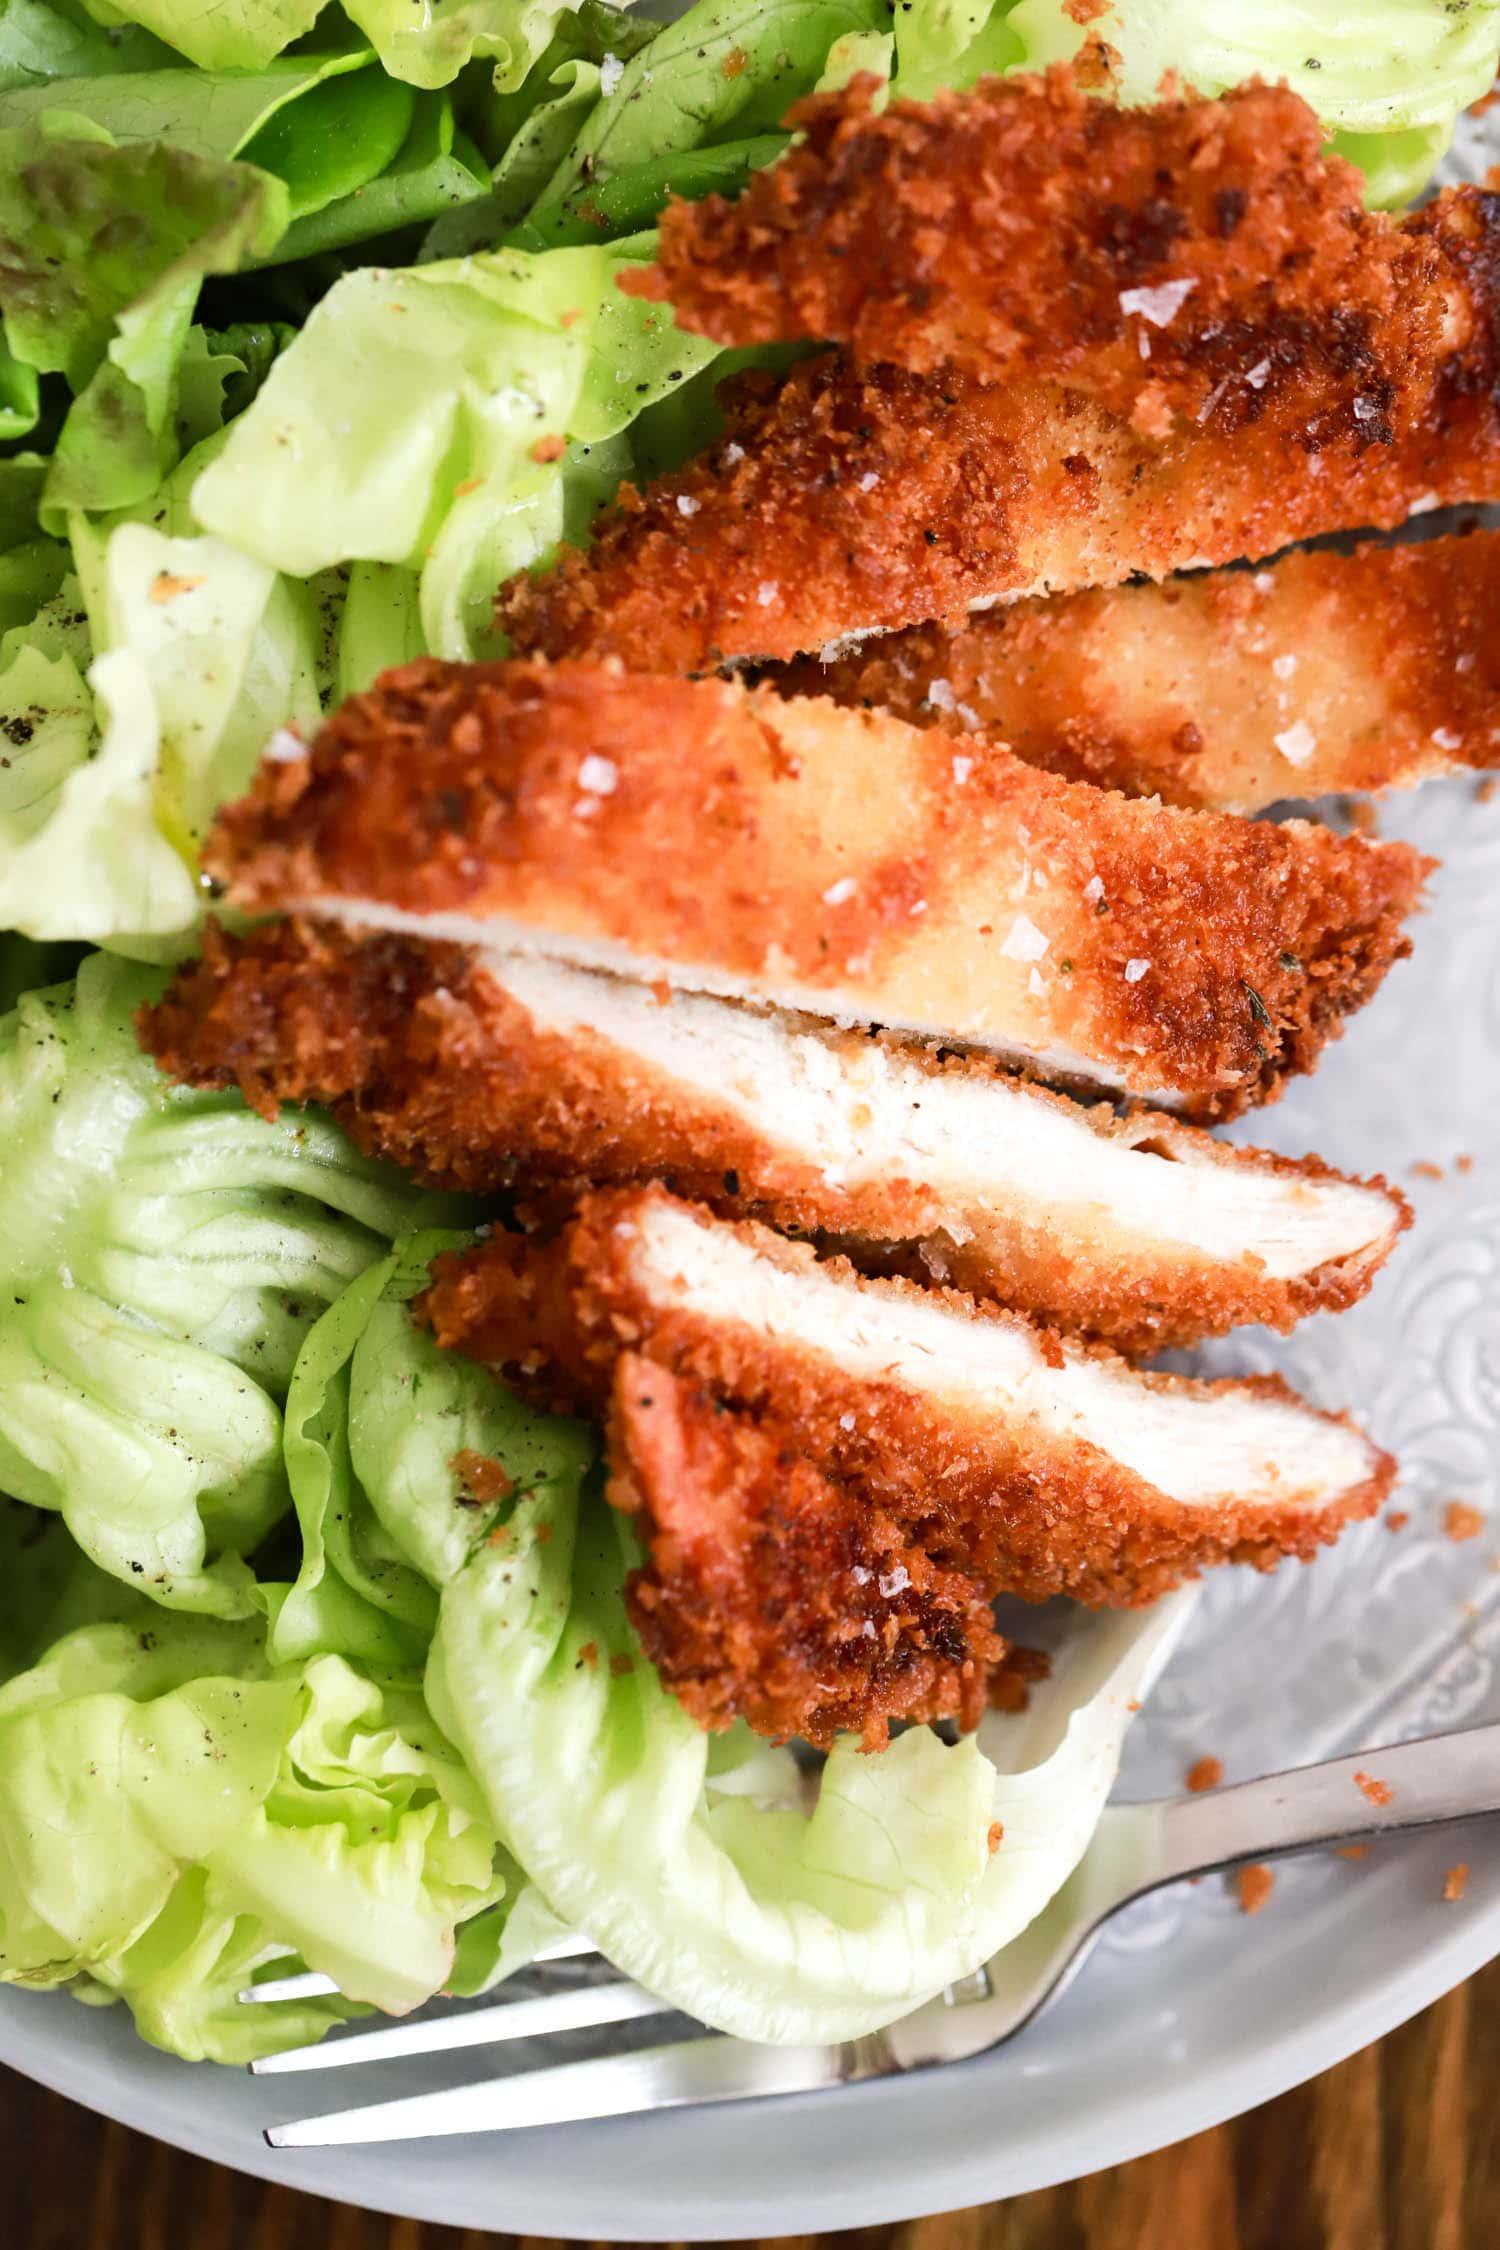 sliced baked chicken cutlets